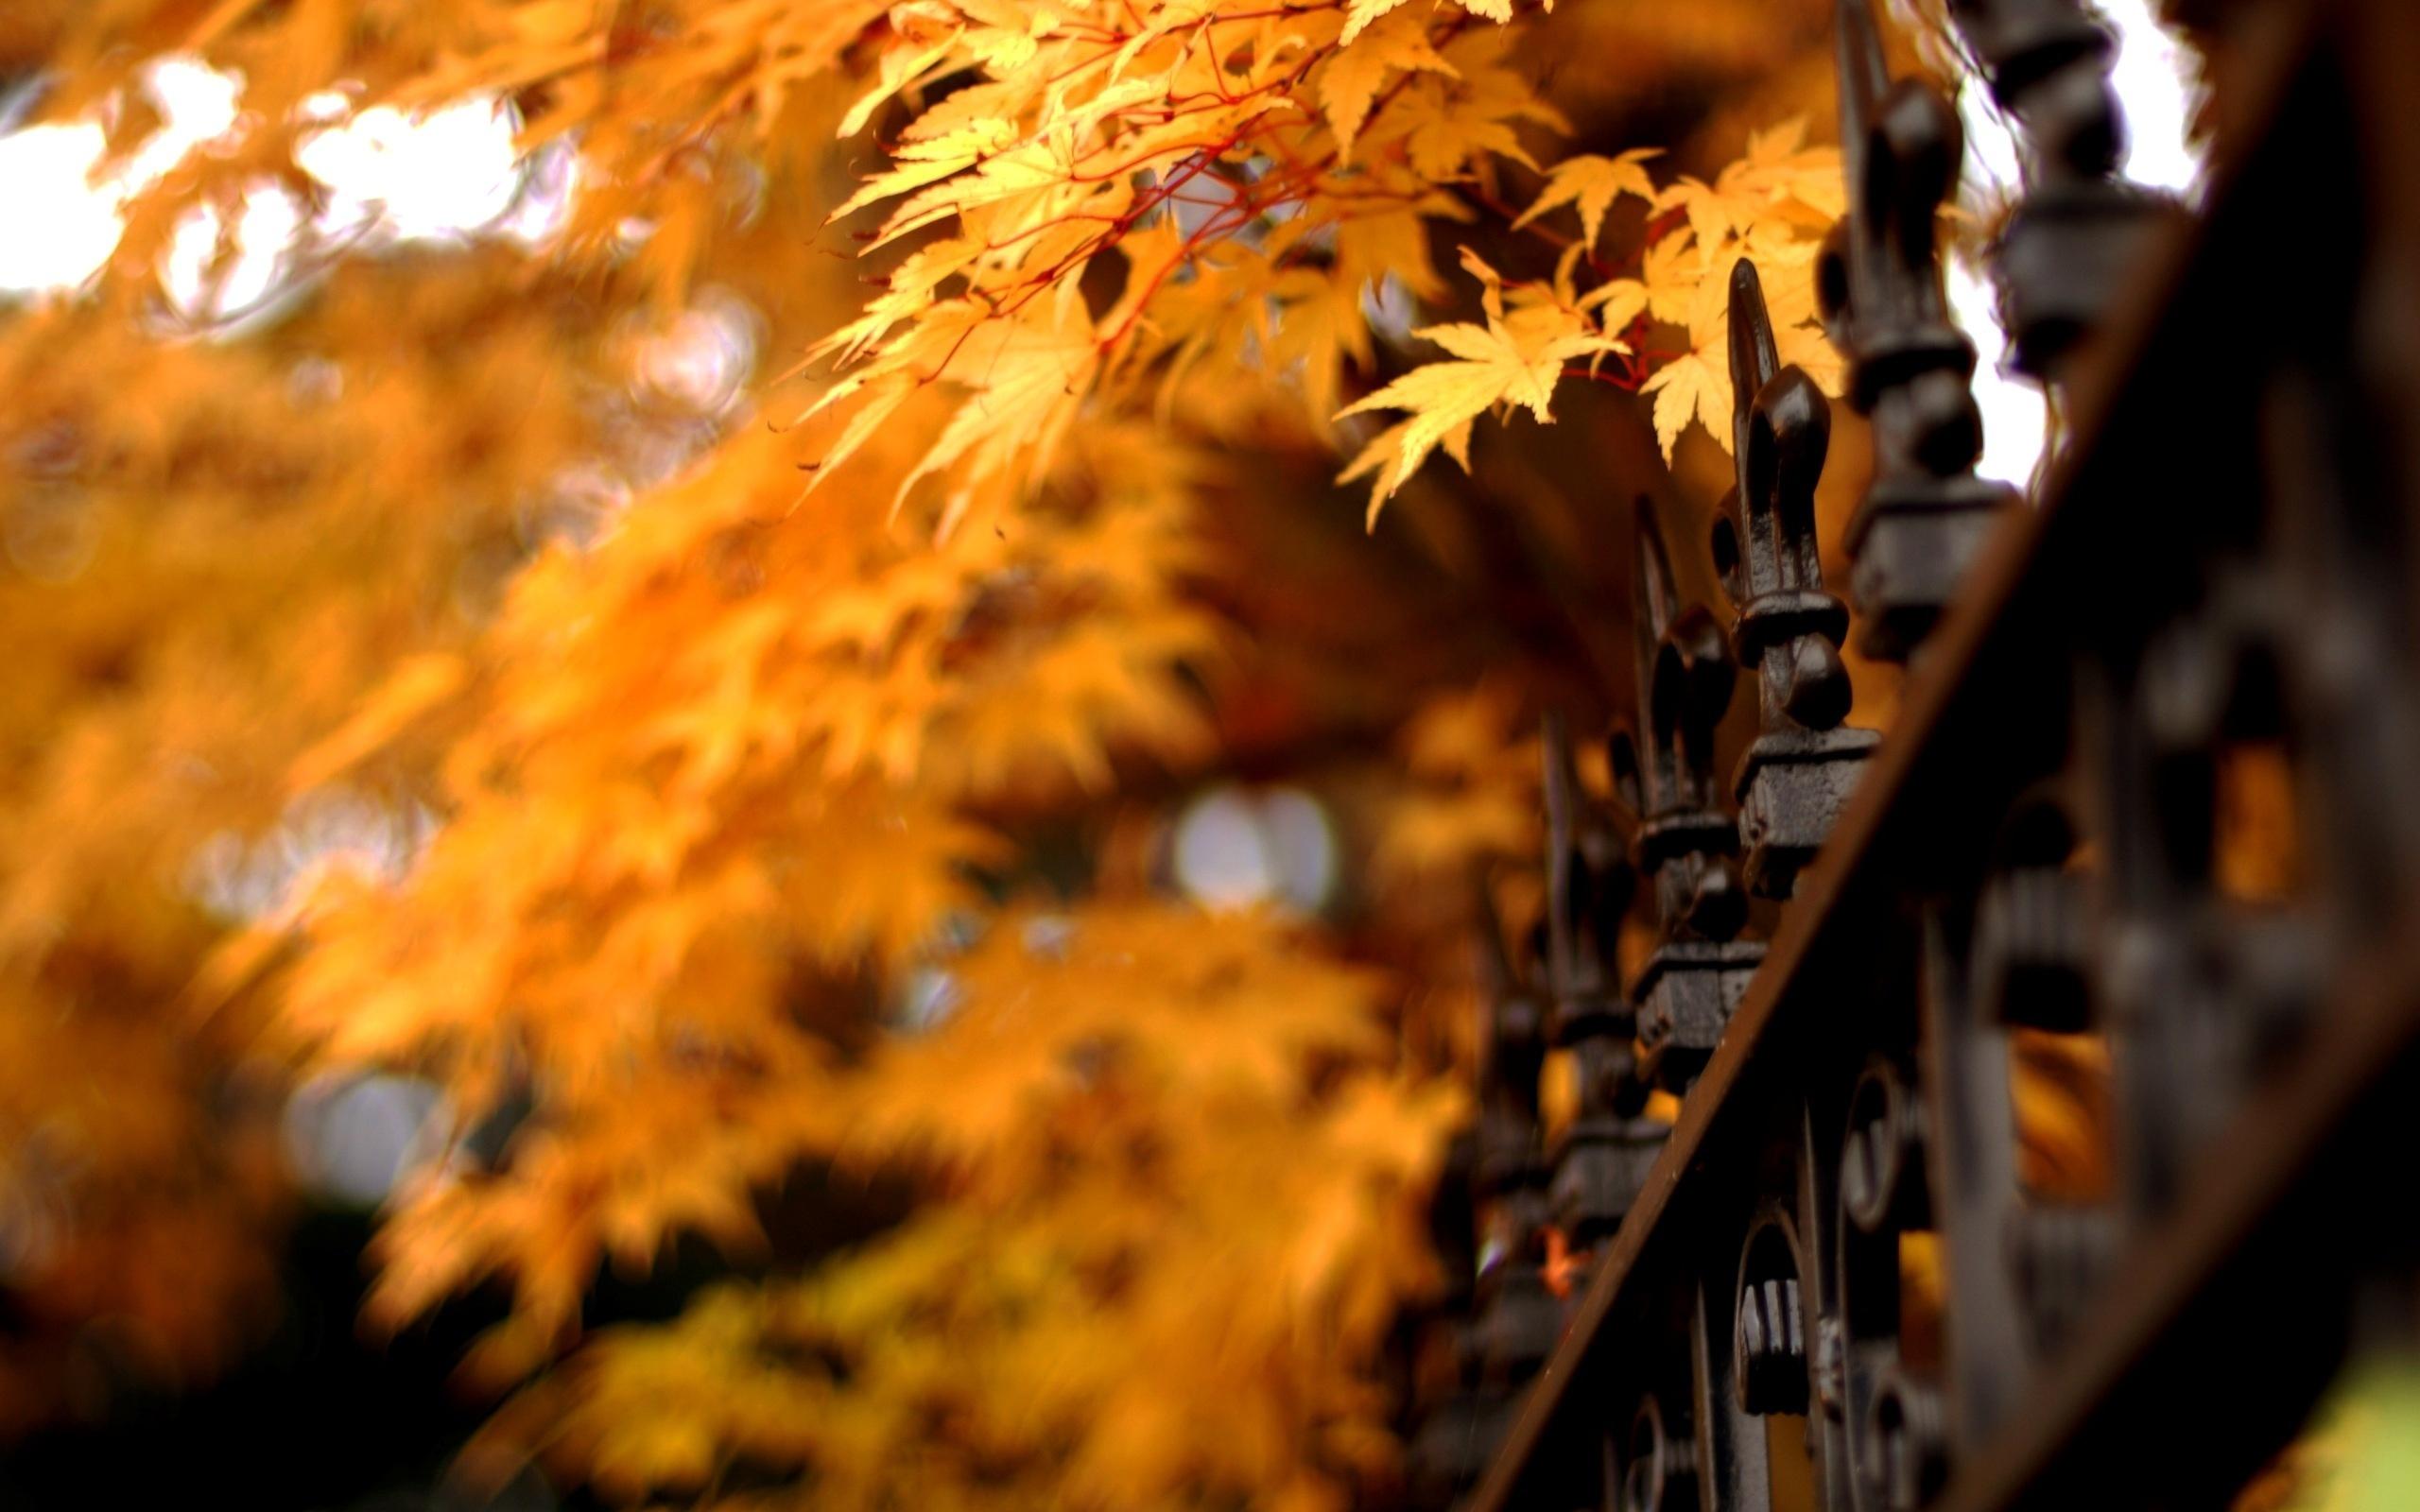 wallpaper iron fence - photo #31